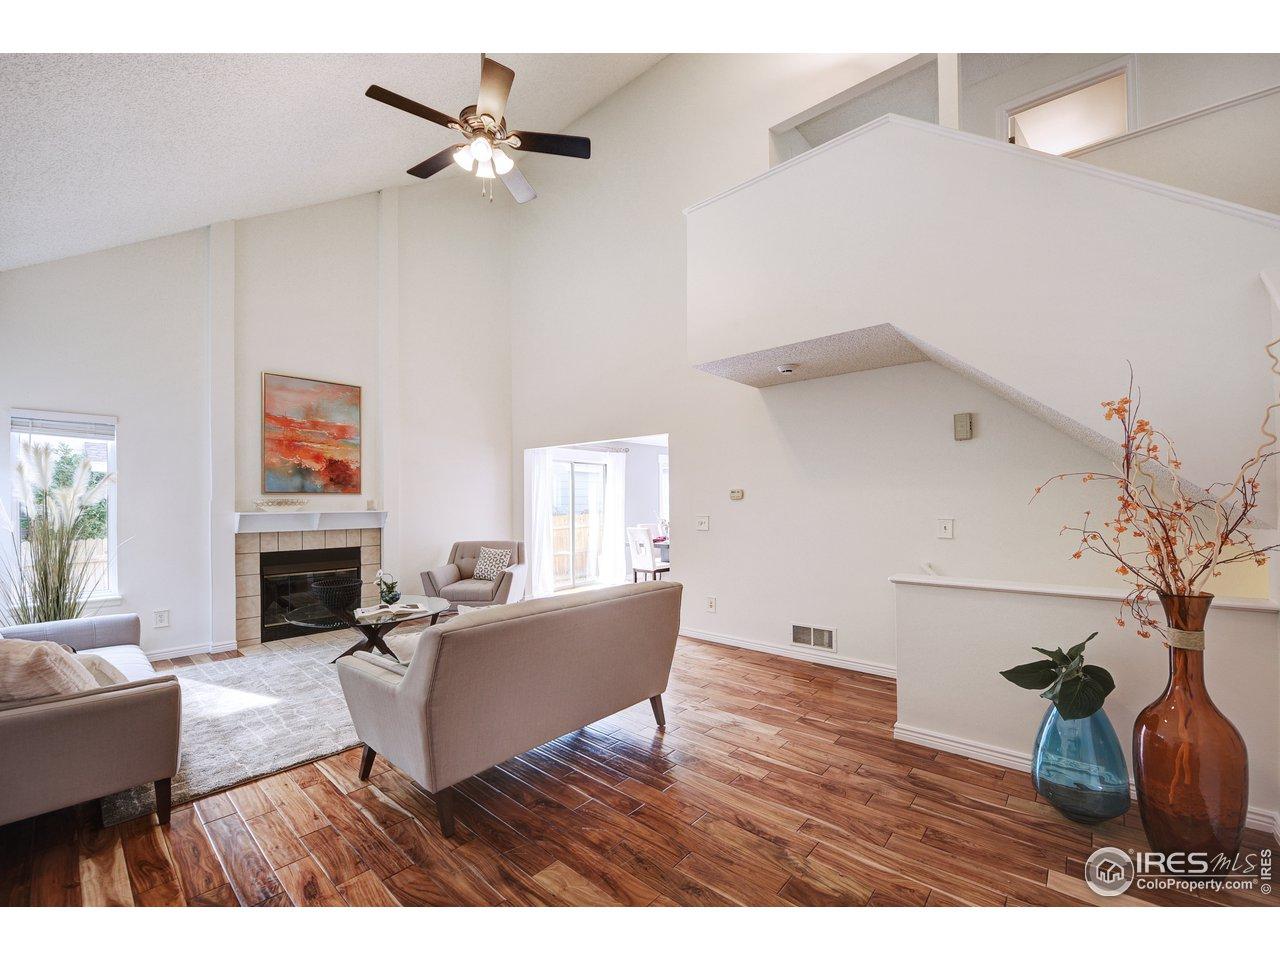 Elegant Great Room with Acacia wood floors